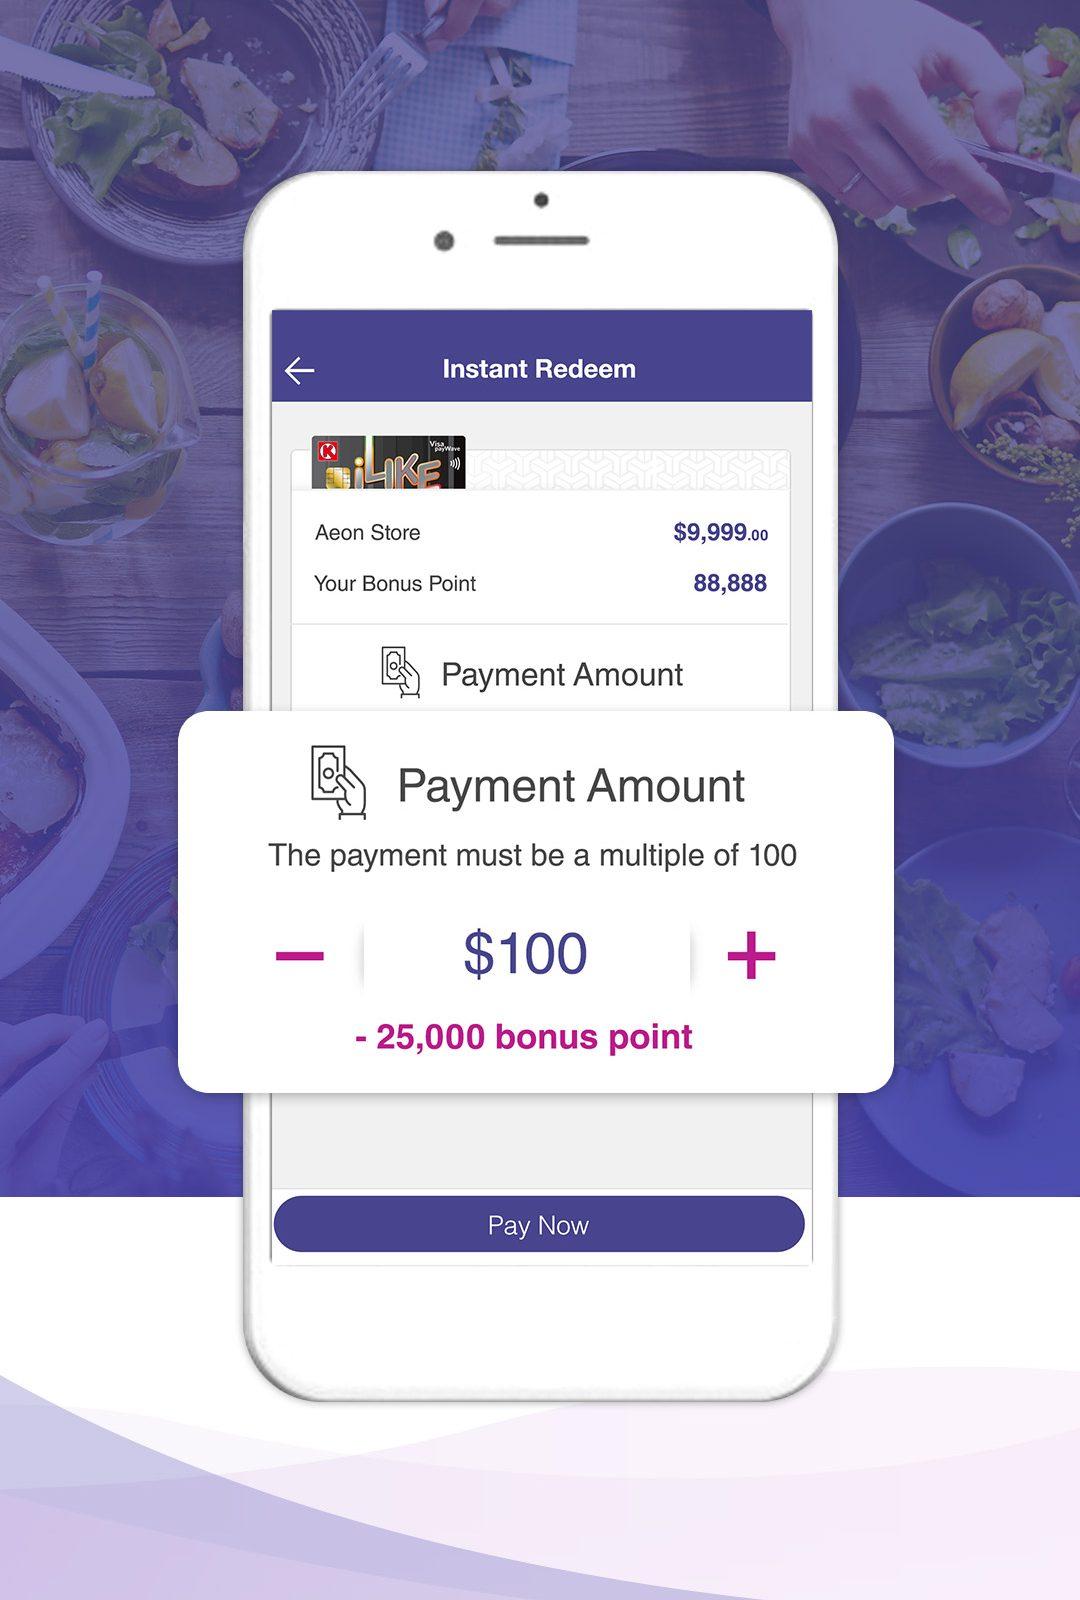 Spending Rewards Program with Aeon HK App